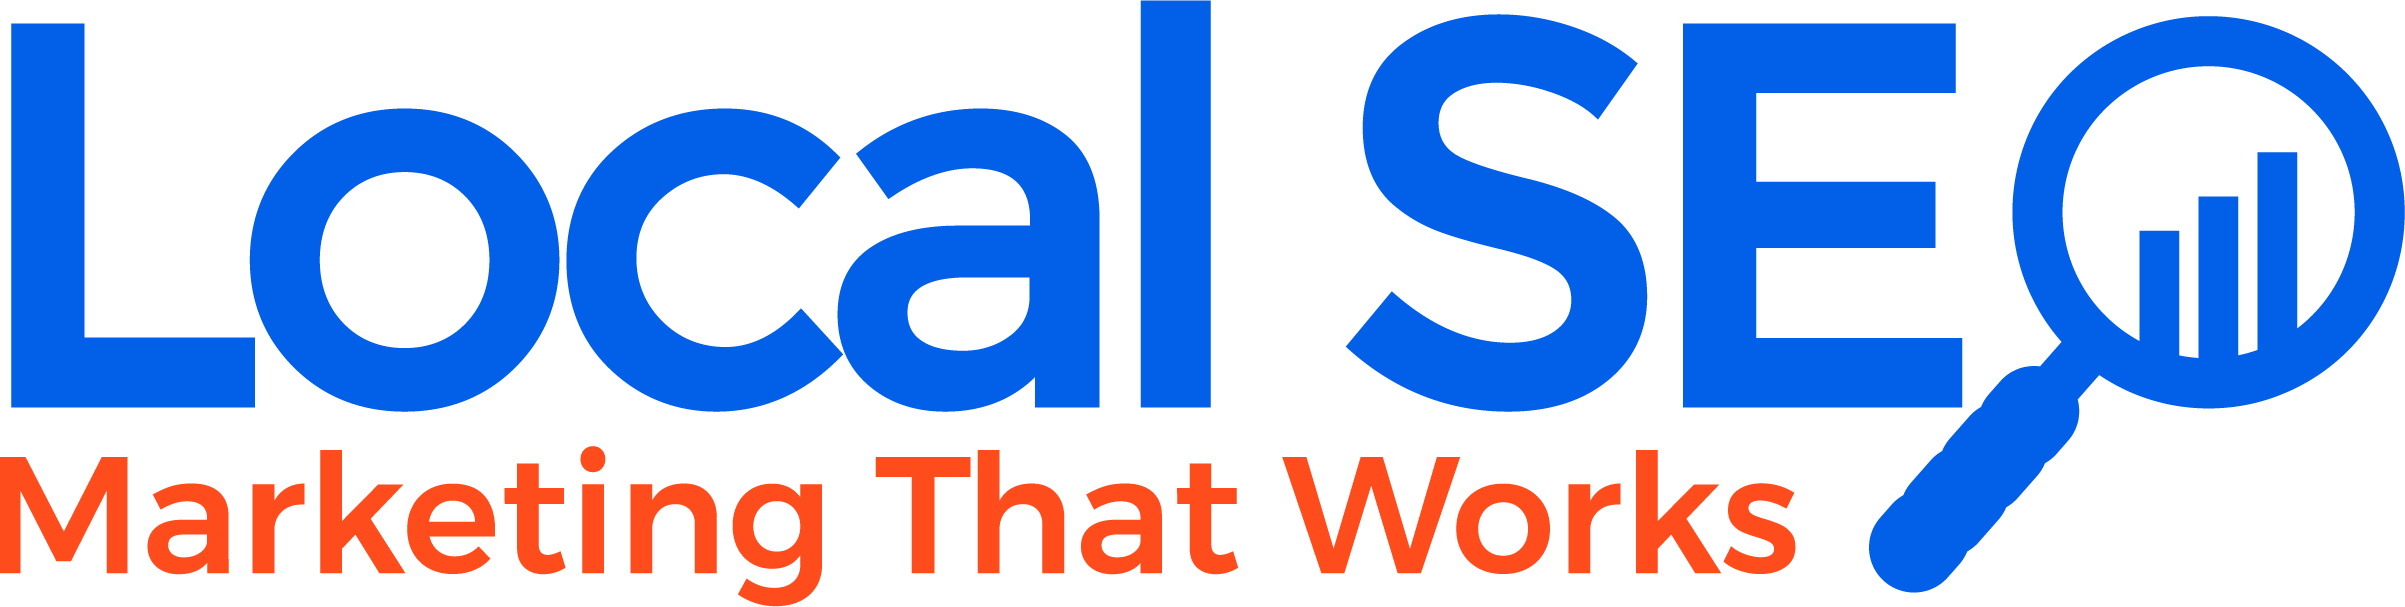 Local SEO Marketing Services